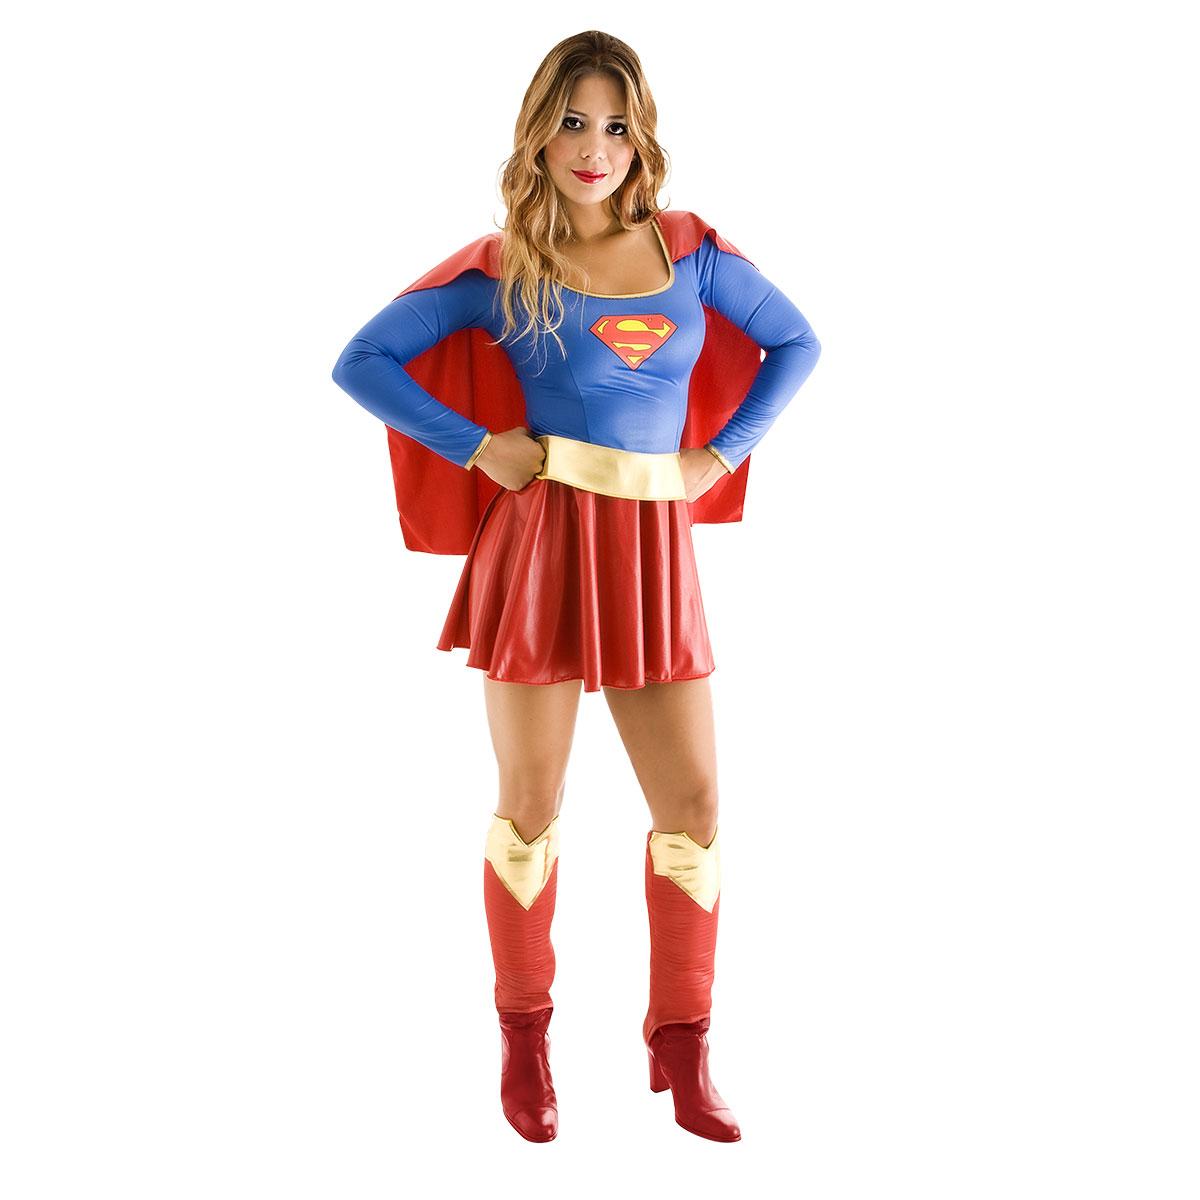 Fantasia Super Mulher - Heat Gilrs Tam M